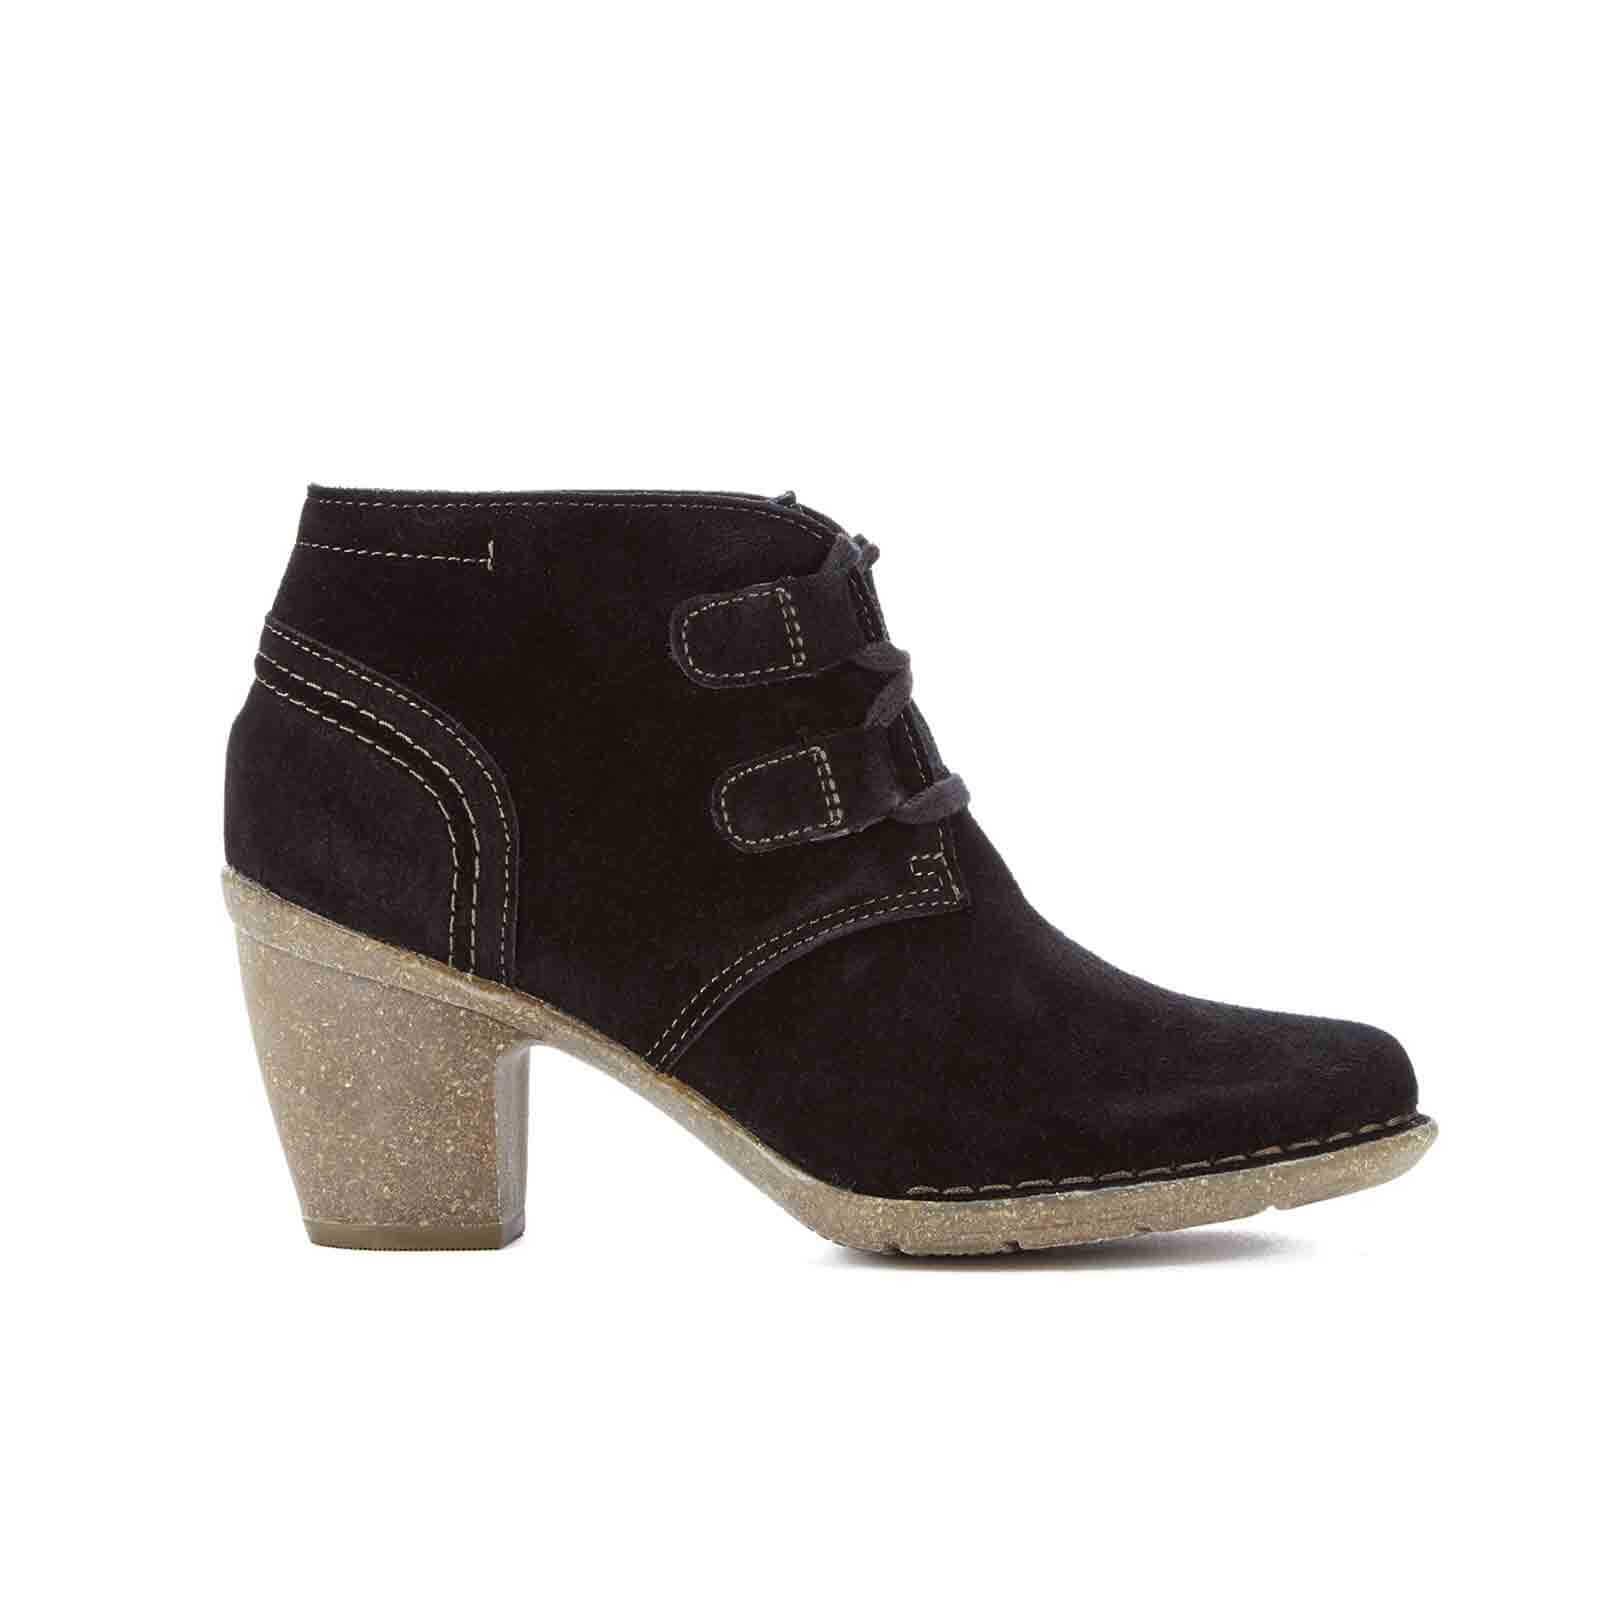 d6222e1d3 Clarks Women's Carleta Lyon Suede Heeled Ankle Boots - Black Womens Footwear    TheHut.com